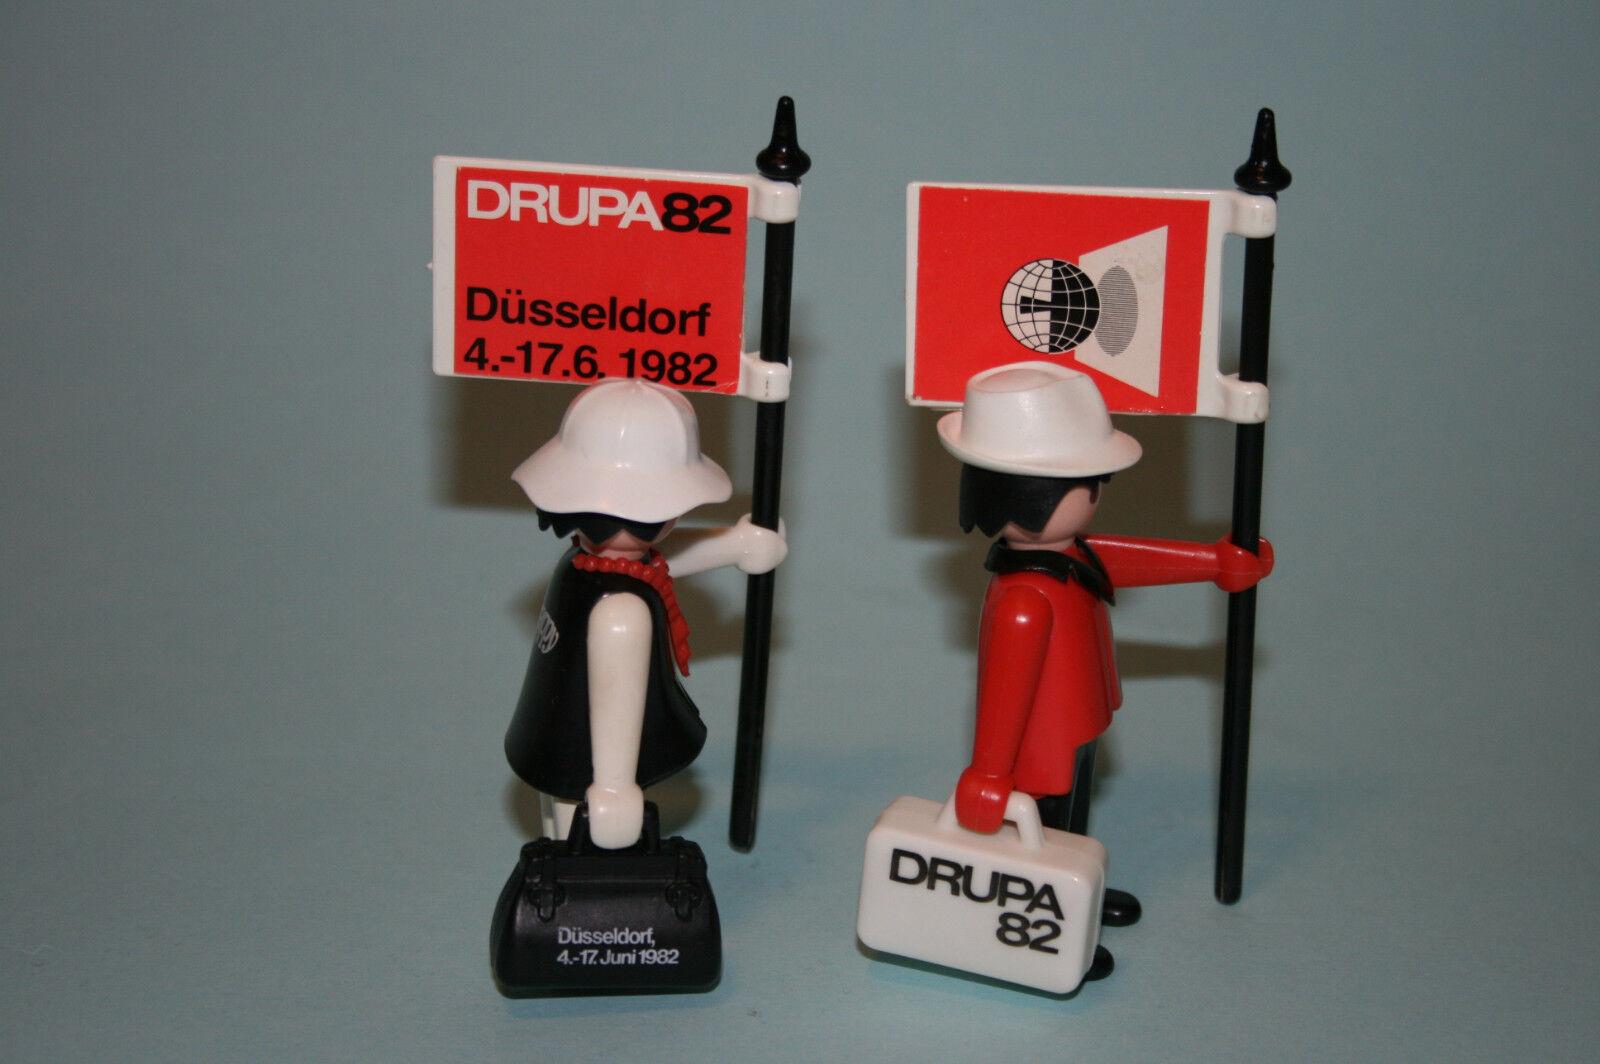 PLAYMOBIL Happy Drupa 1982 Sonderfiguren Sonderfiguren Sonderfiguren  Promo - selten -  | Bestellungen Sind Willkommen  4b8462